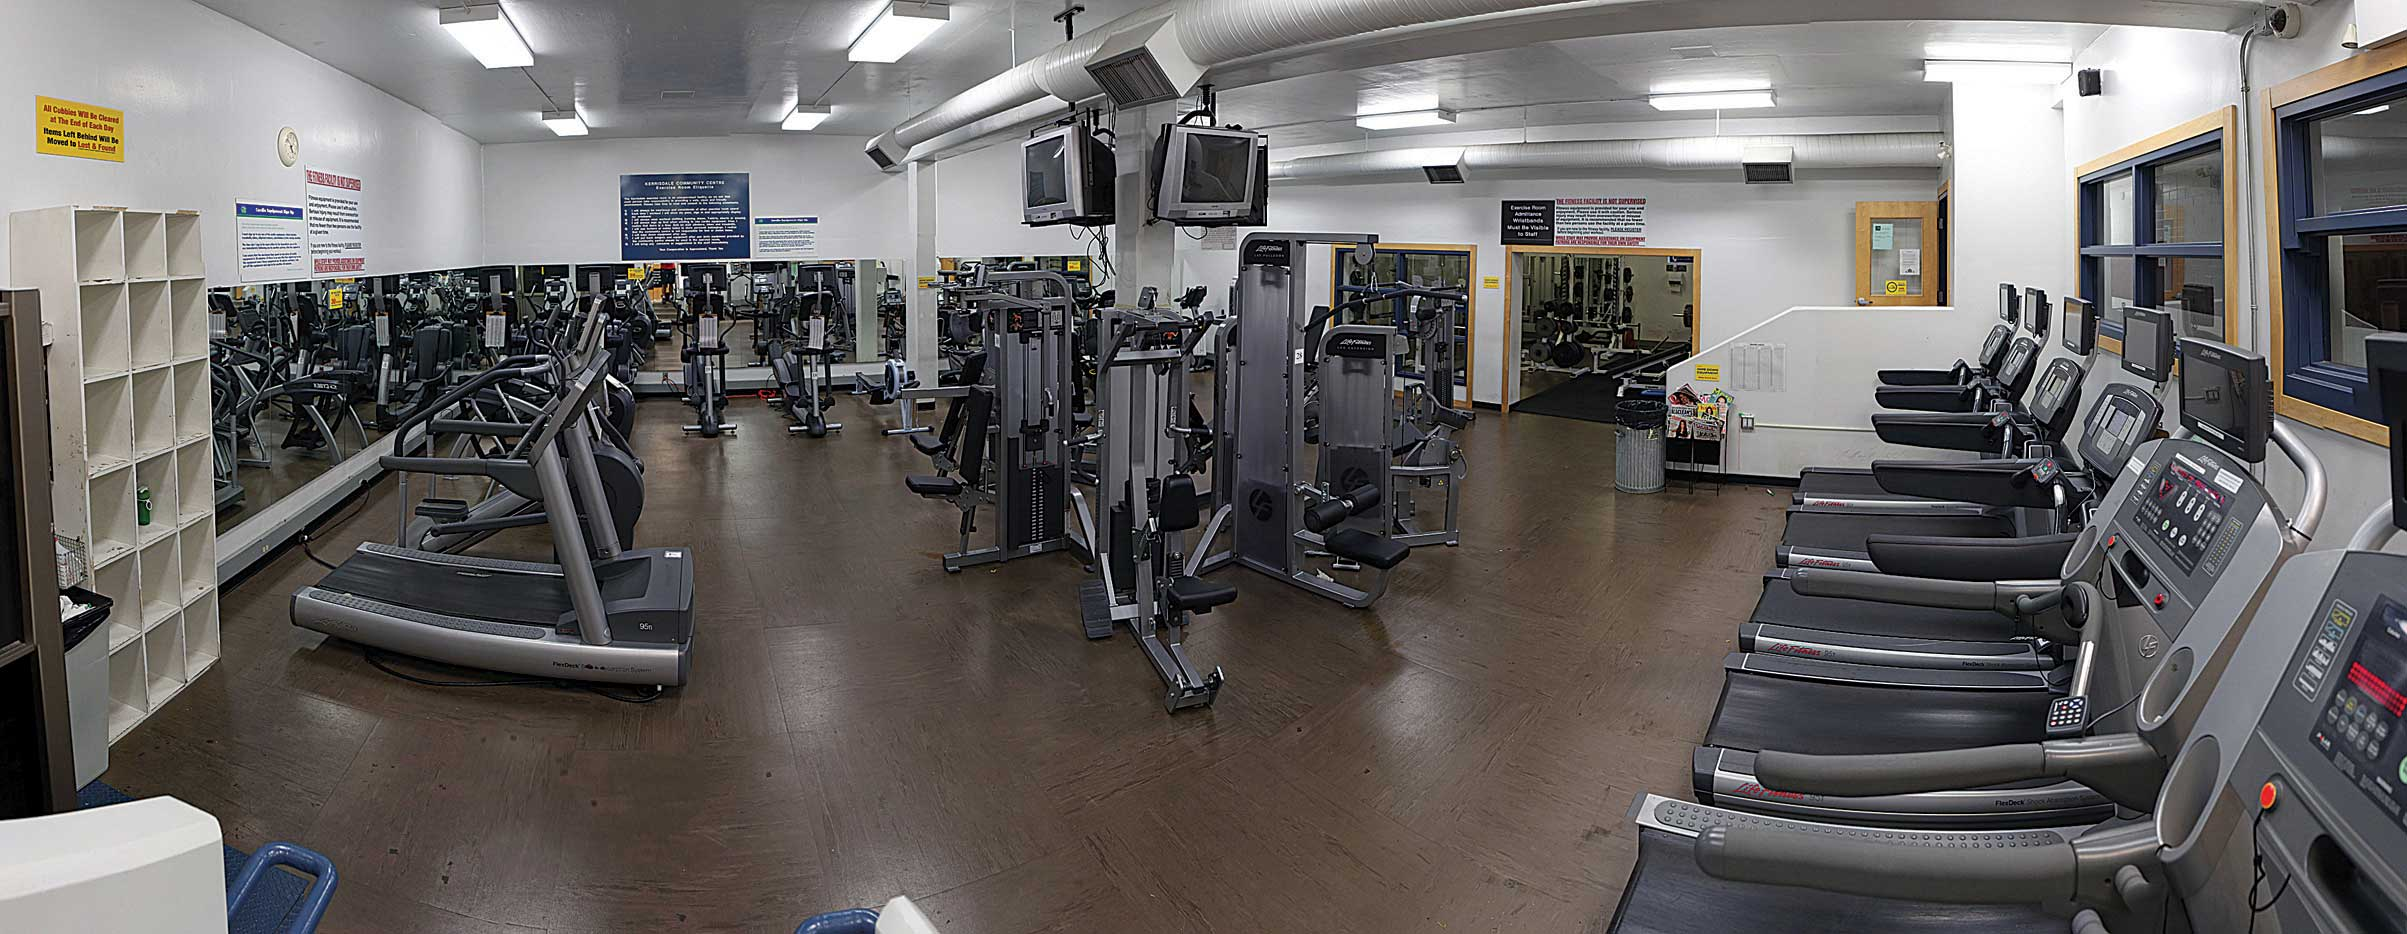 Exercise room kerrisdale community centre